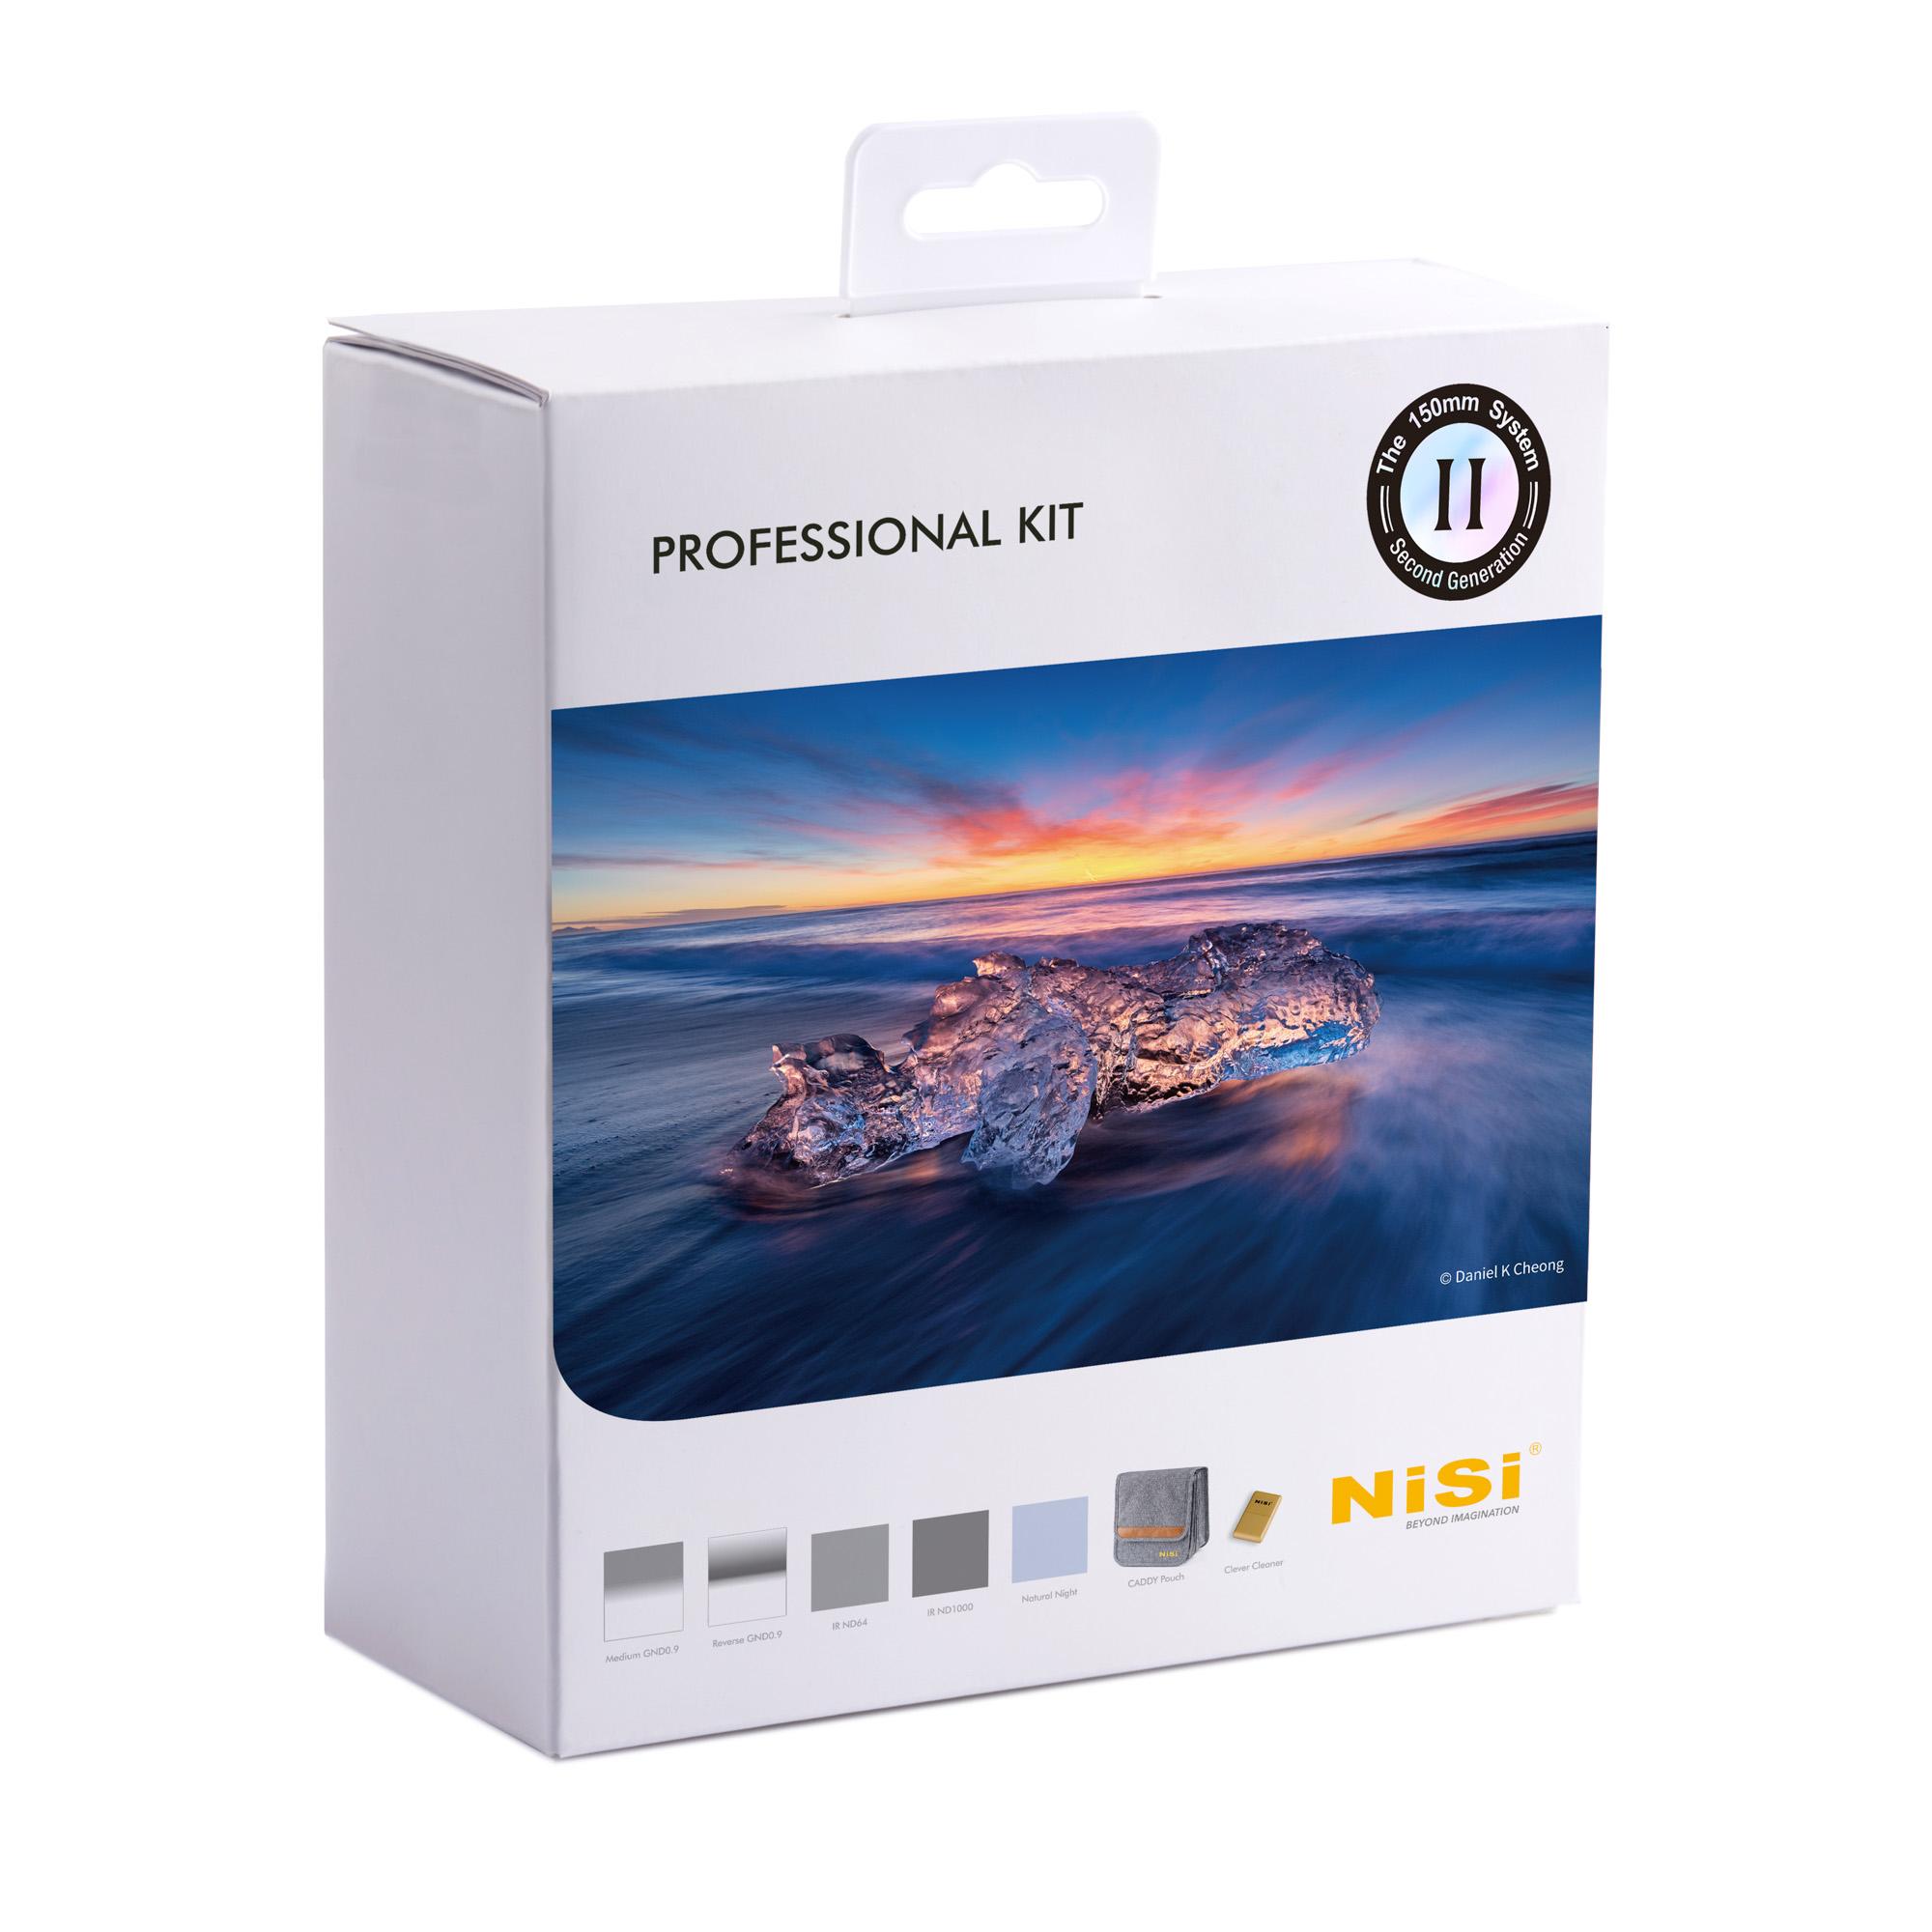 NiSi Filters 150mm Professional Kit Second Generation II